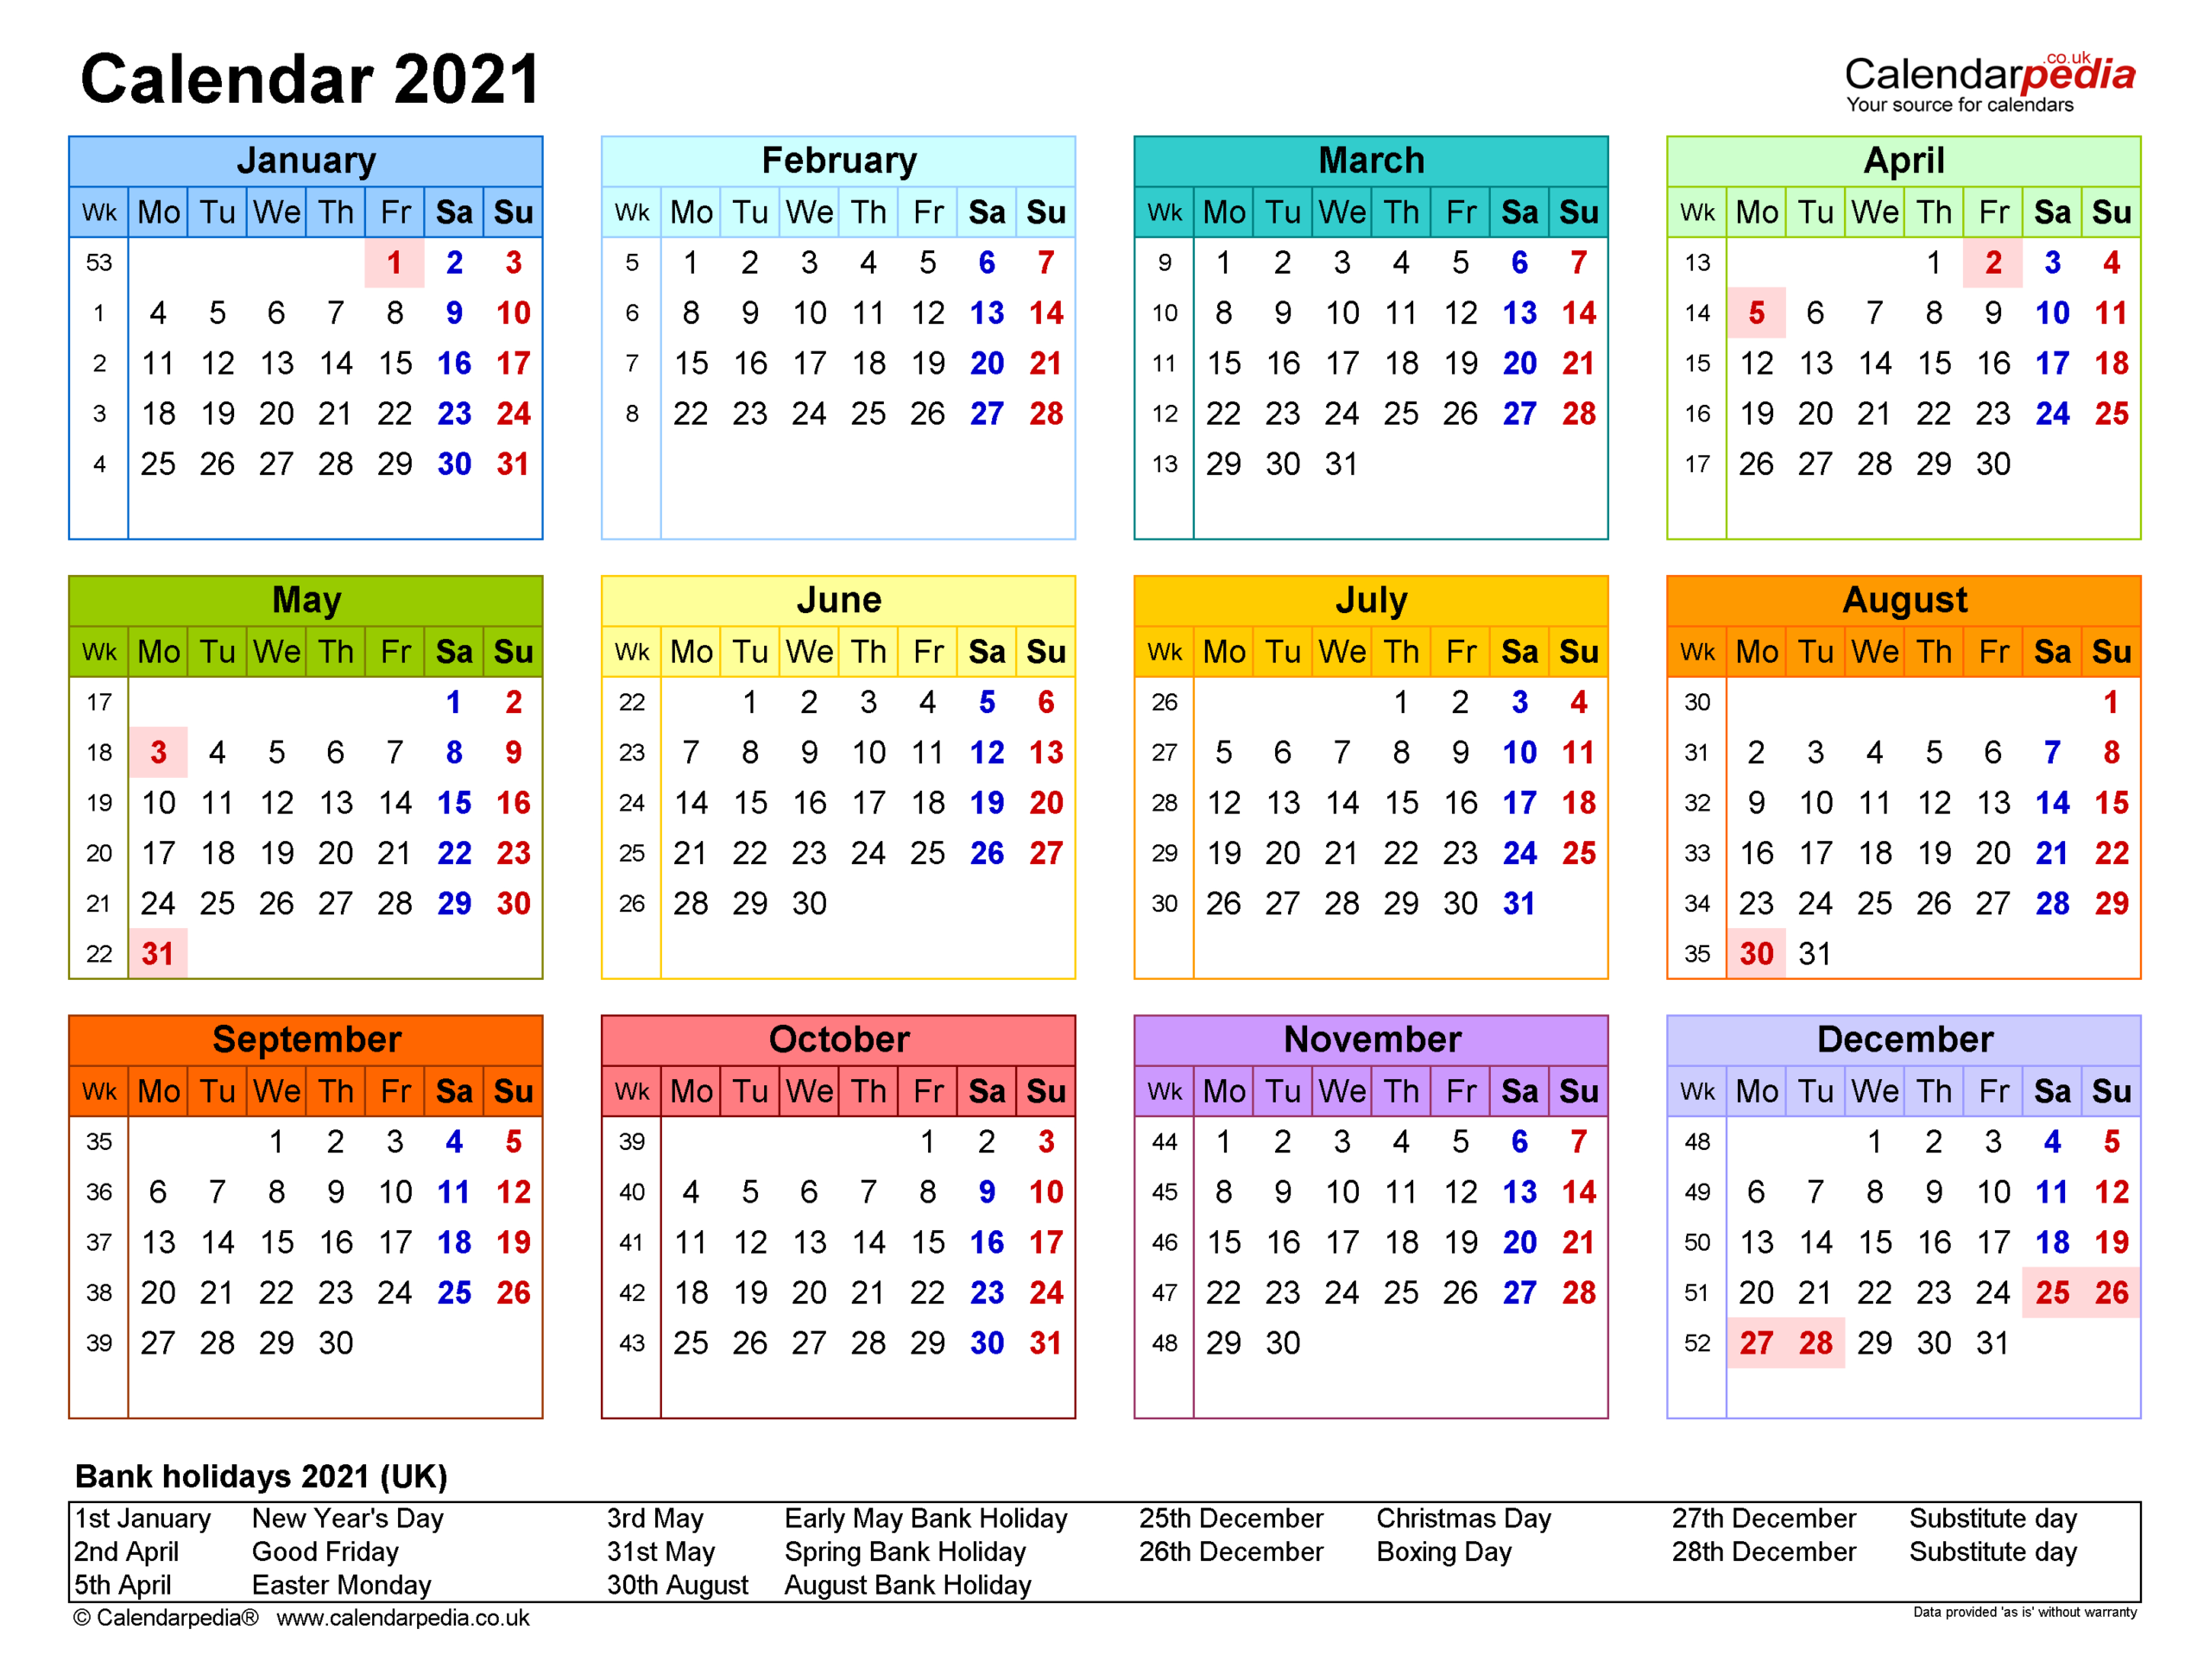 Calendar 2021 (Uk) - Free Printable Pdf Templates for Calendario Vertex 2021